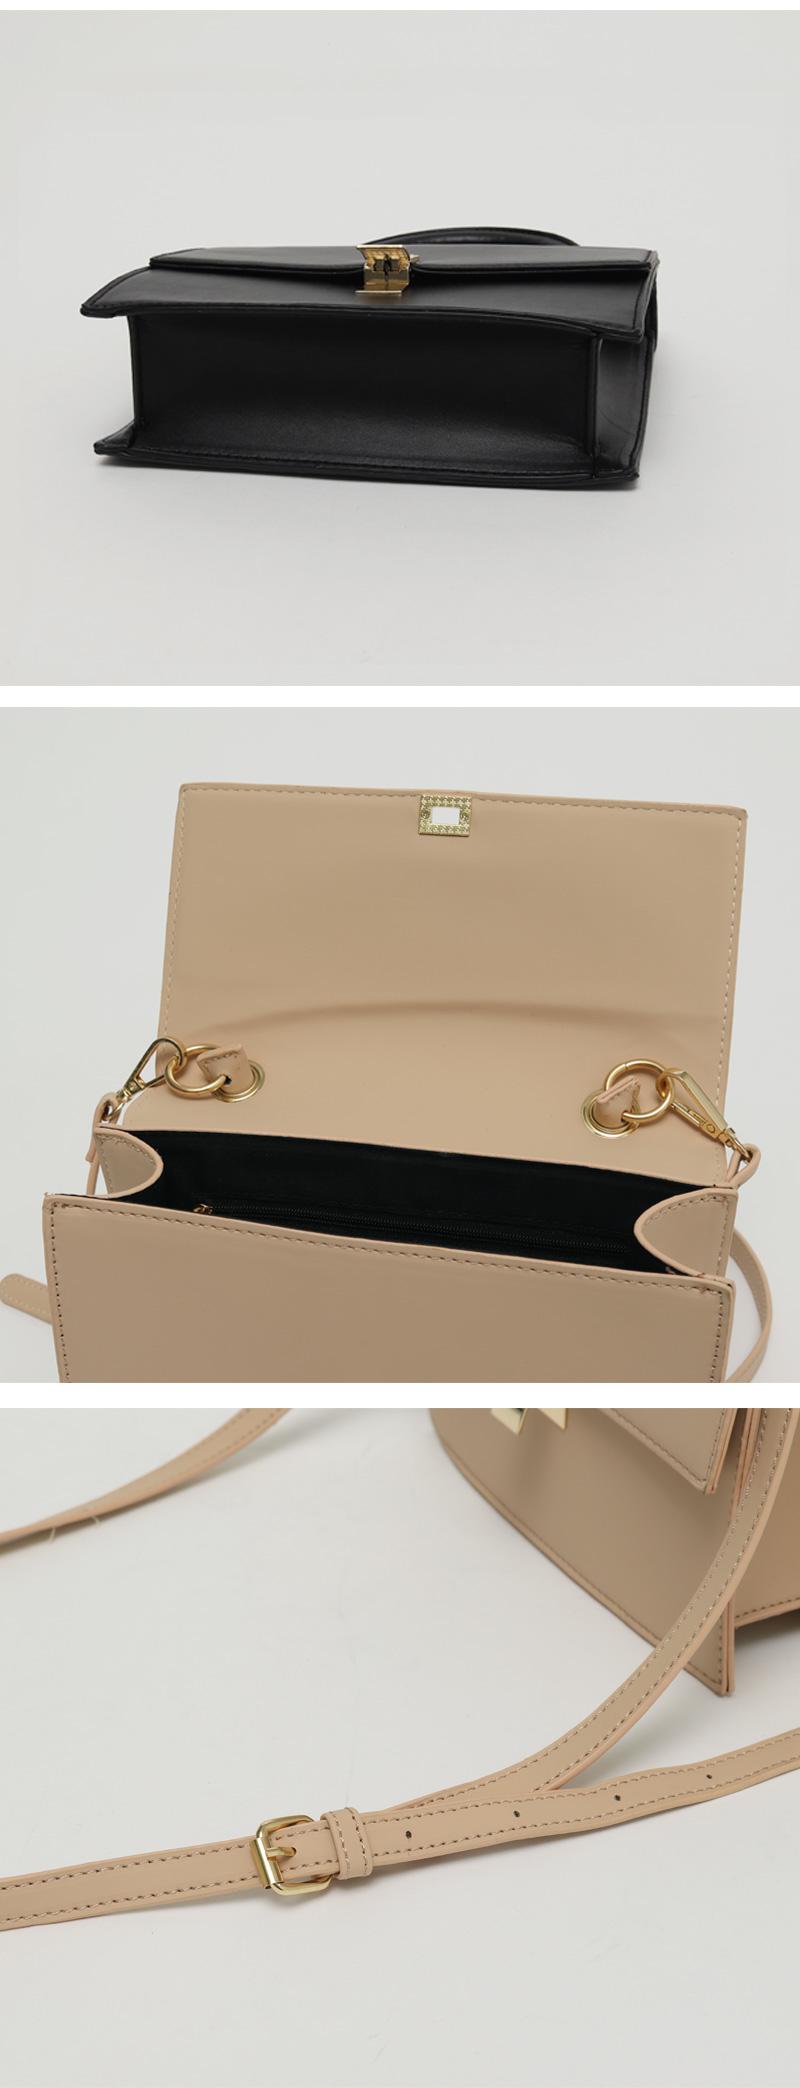 Blank gold buckle bag_C